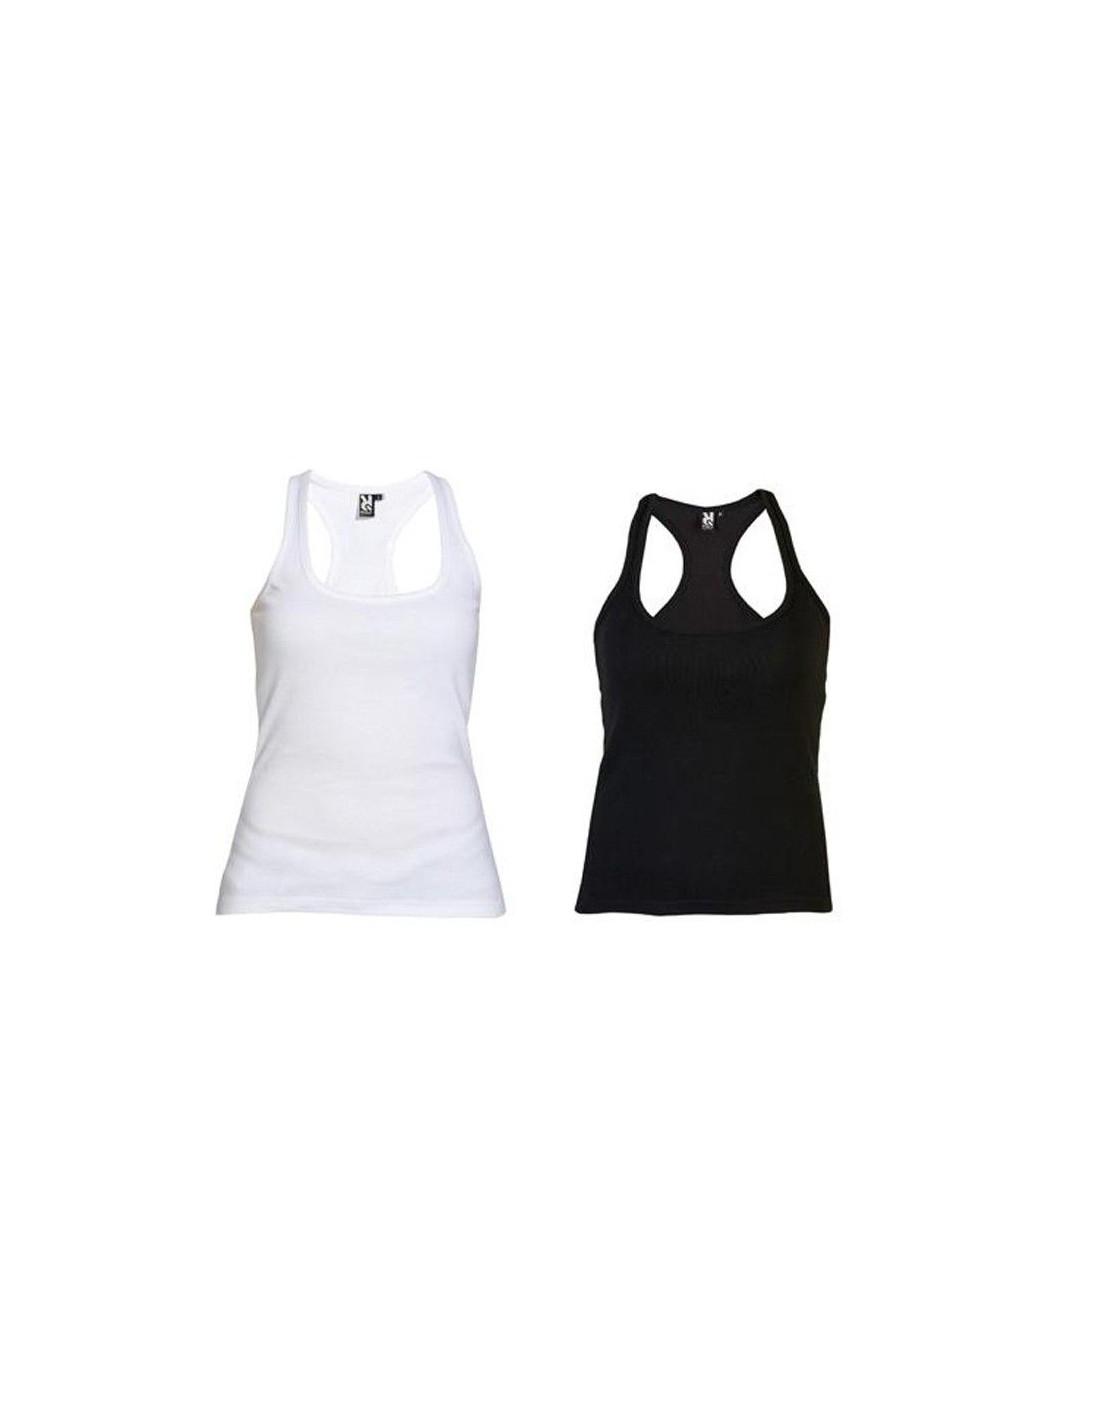 Camiseta Tienda Bacanal Tirantes Disfraces En Comprar Carolina Mujer  fAvfpwqrU c0f3defc5d6e